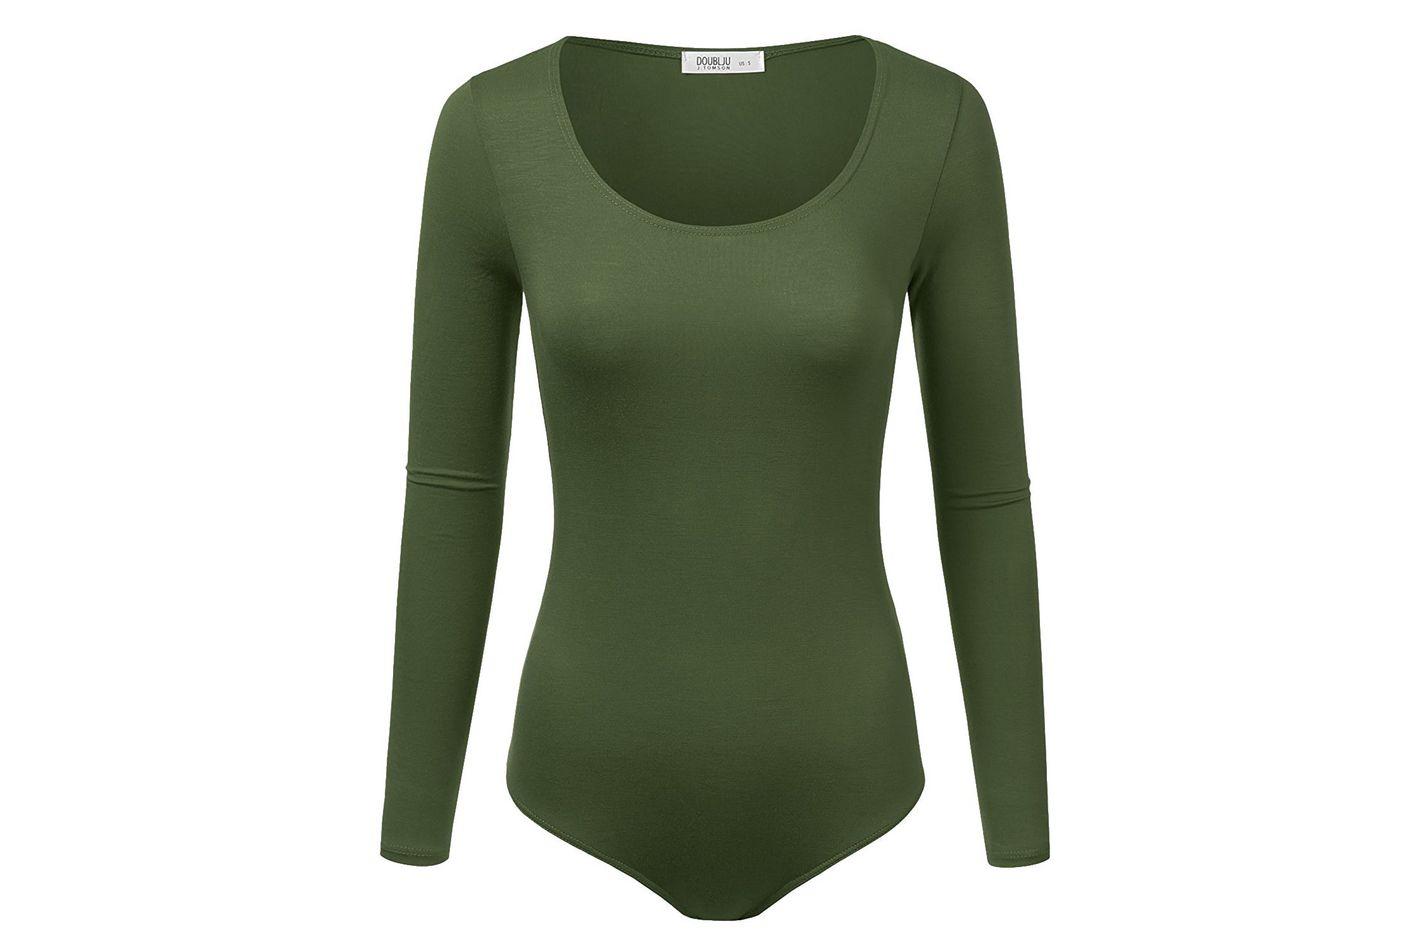 Doublju Stretchy Scoopneck Bodysuit